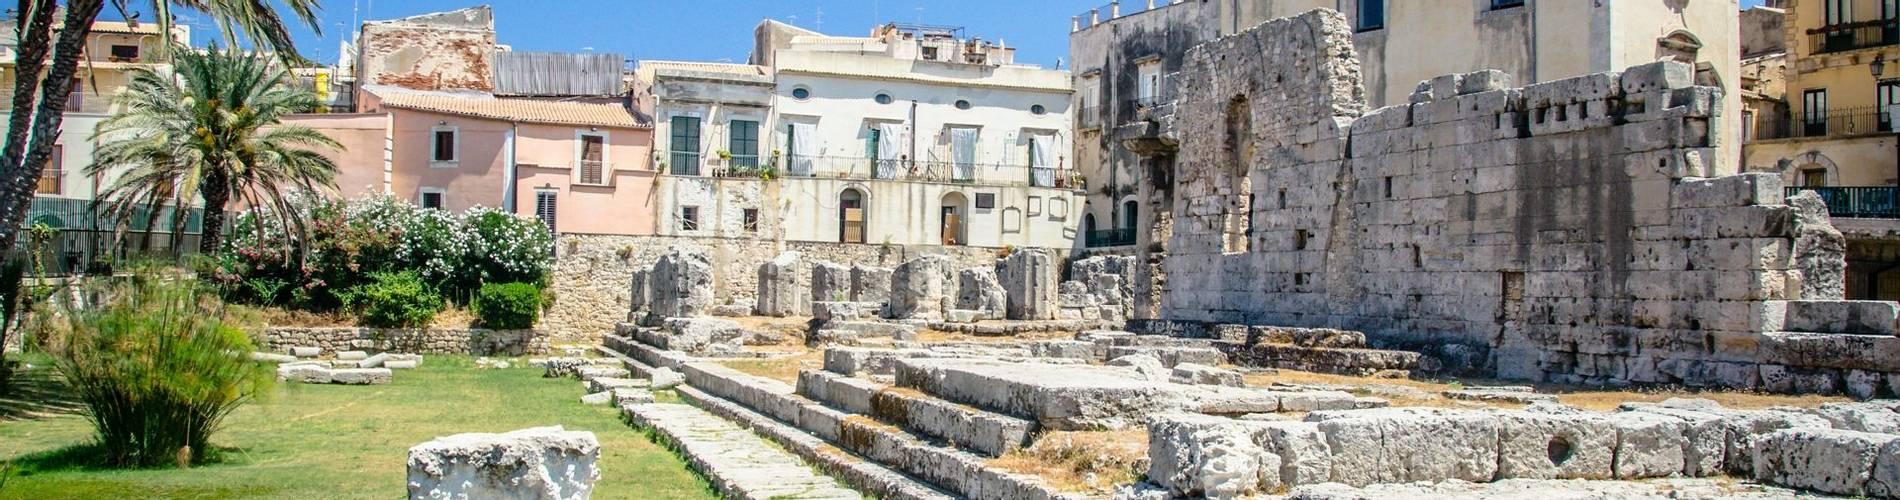 Sicily 2.jpg